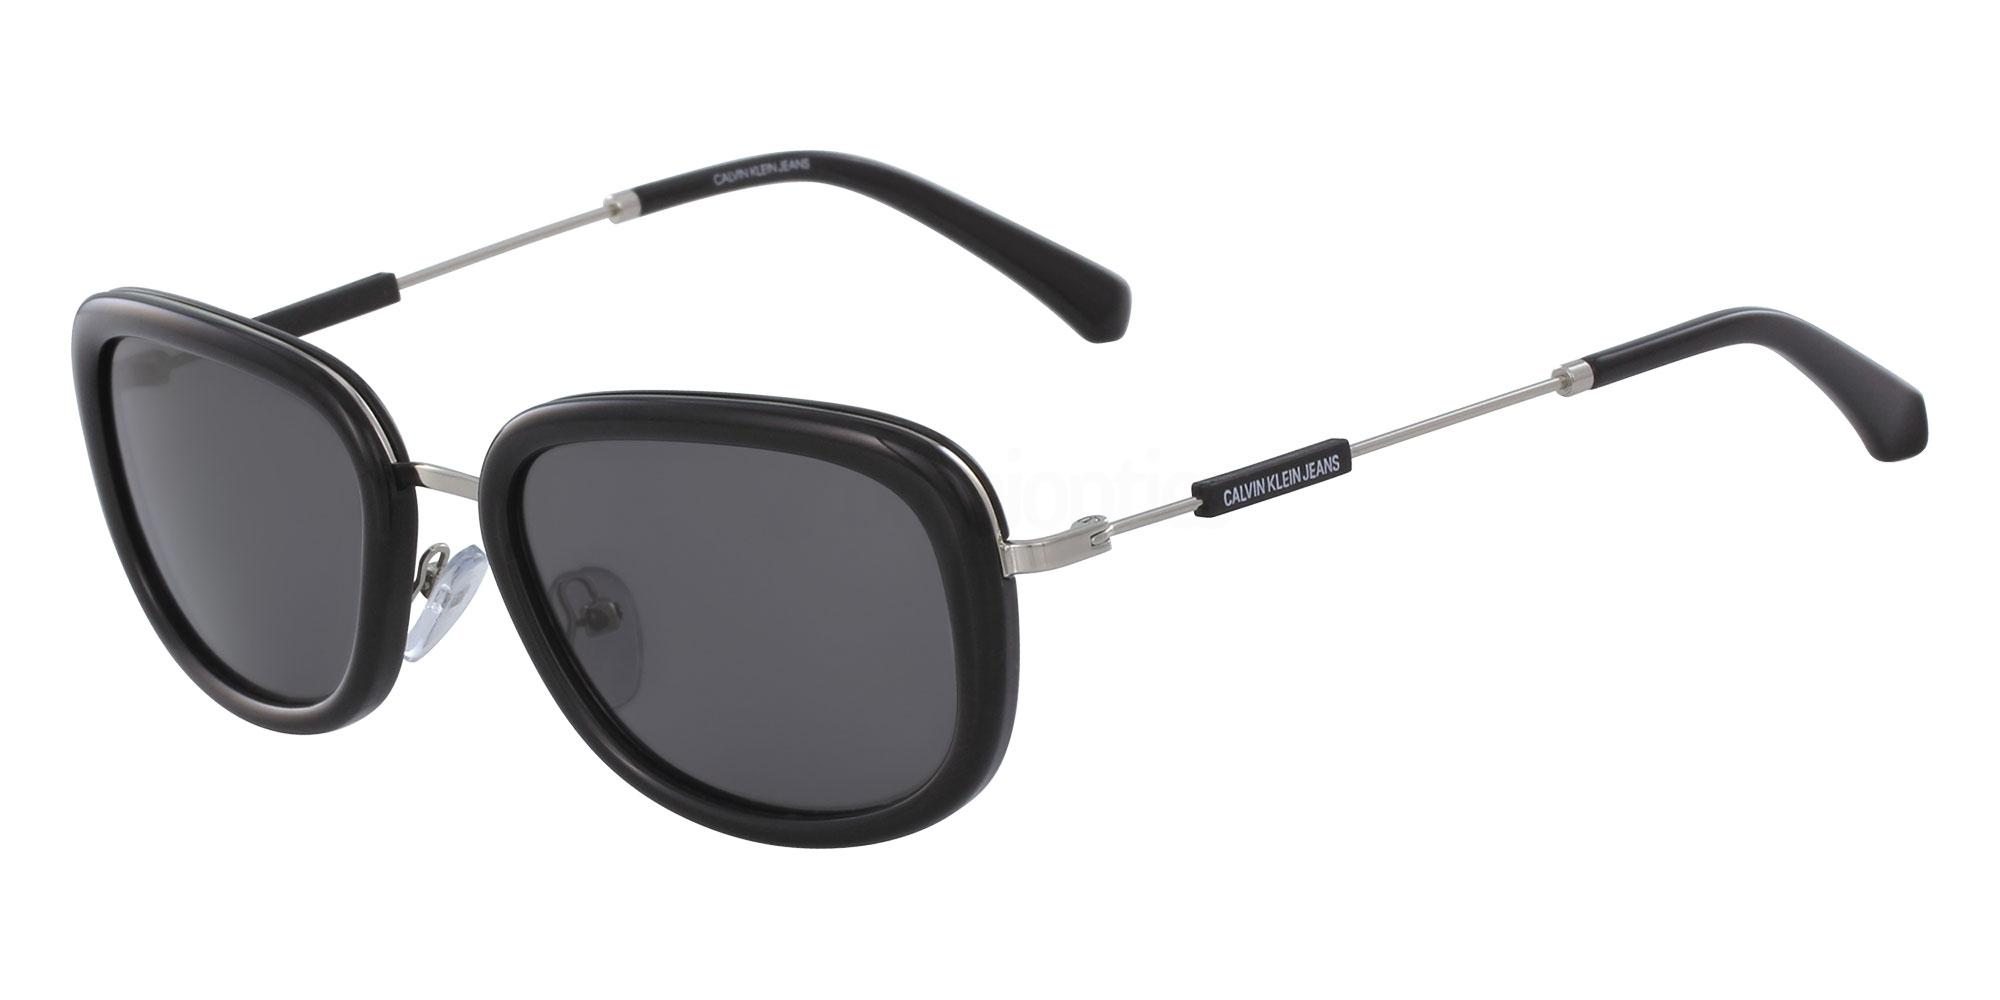 001 CKJ18700S Sunglasses, Calvin Klein Jeans